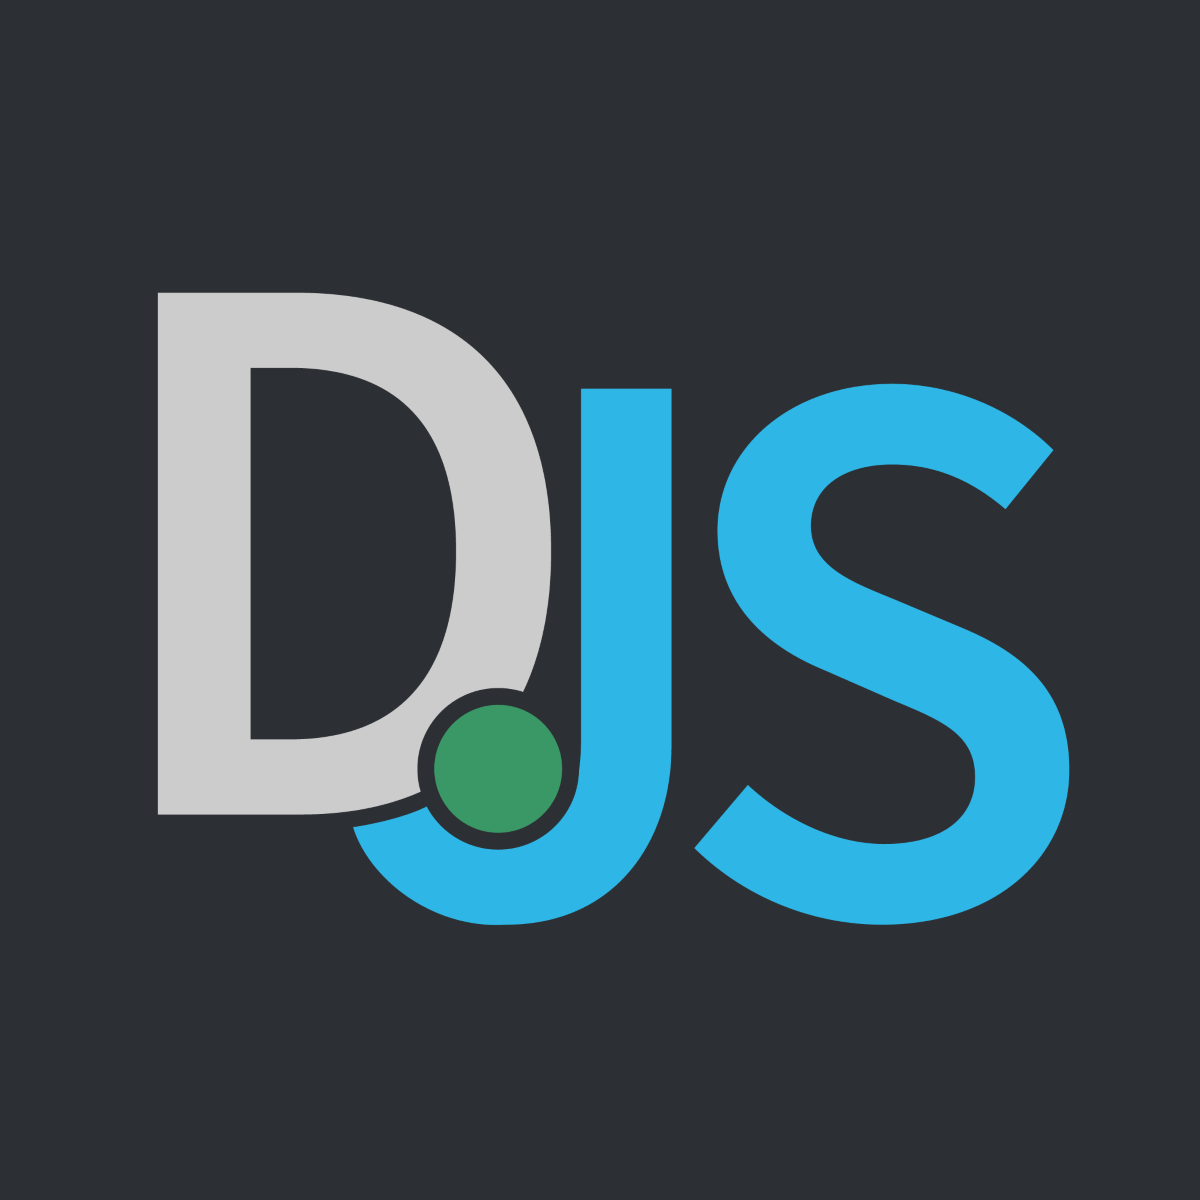 discord.js